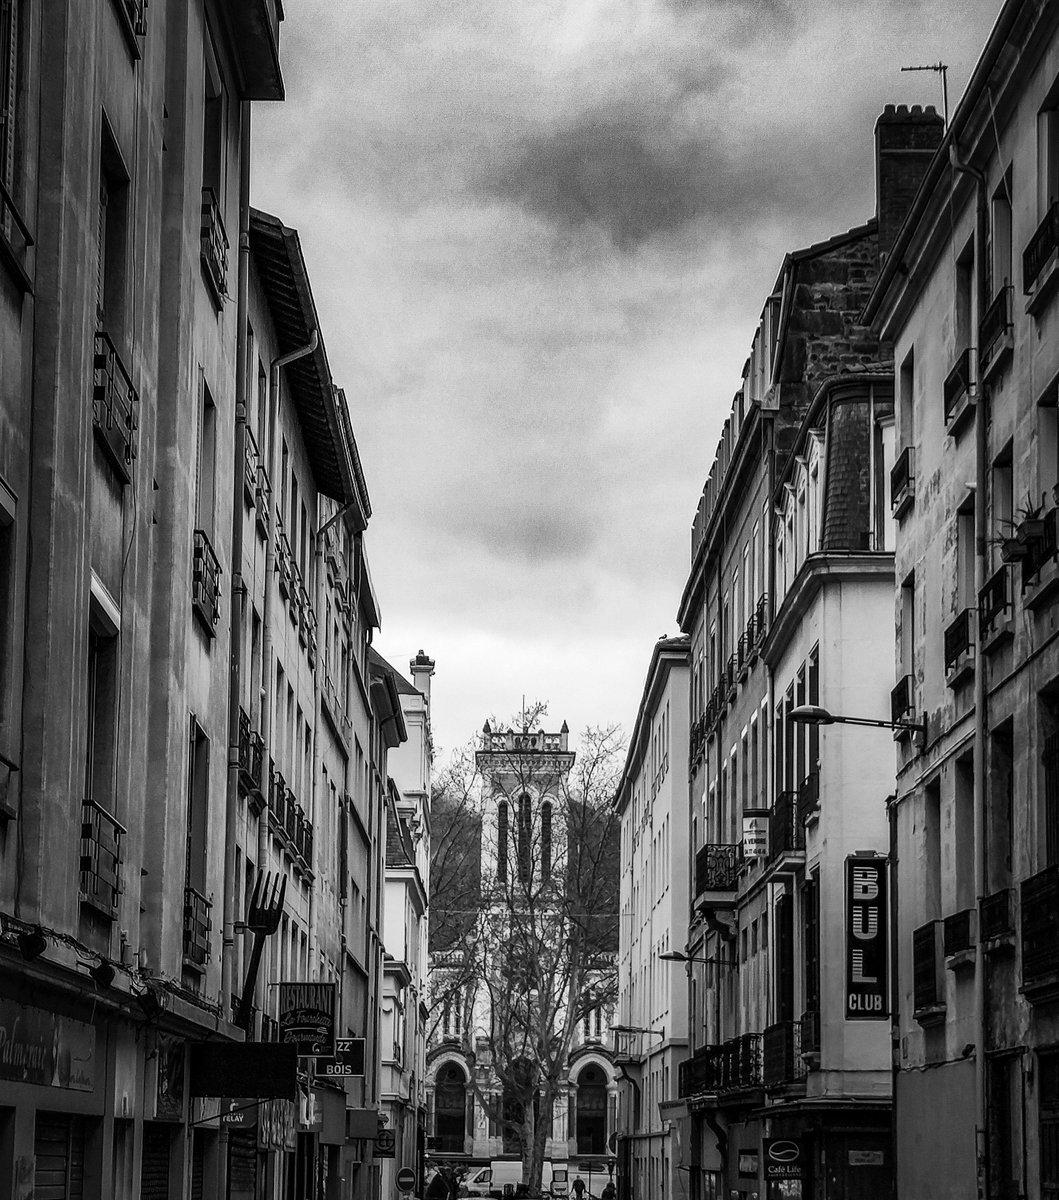 """Apercevoir la cathédrale Saint Charles"" .  #streetphotography #architecture  #saintetienne #bnw #photo #bnw_captures #photooftheday #photography #blackandwhite #blackandwhitephotography #Monochrome #art"